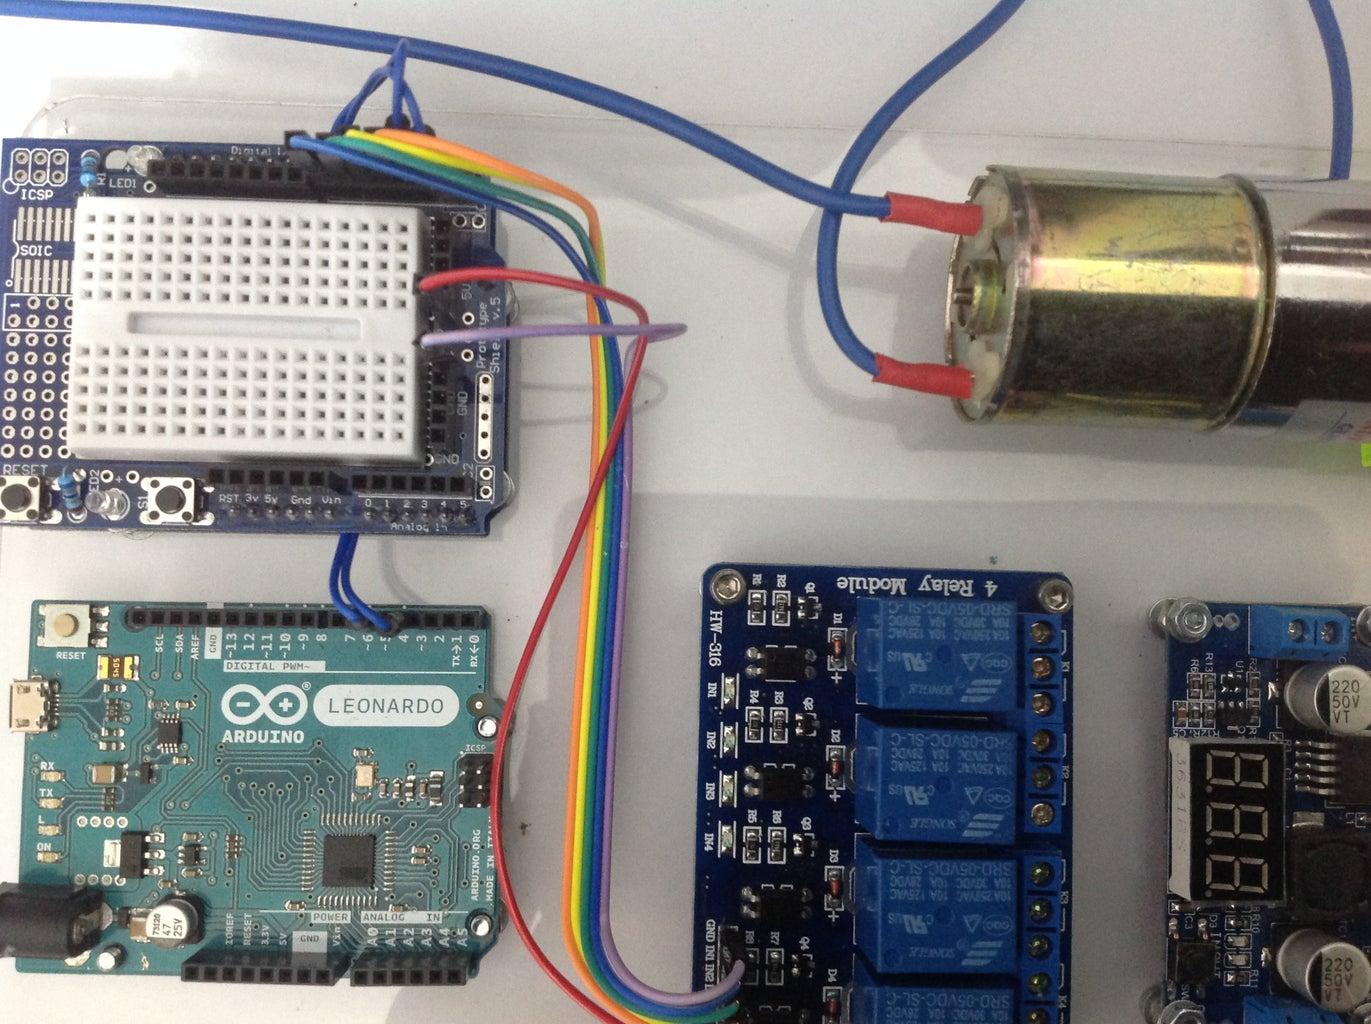 Wiring - Signal Wires